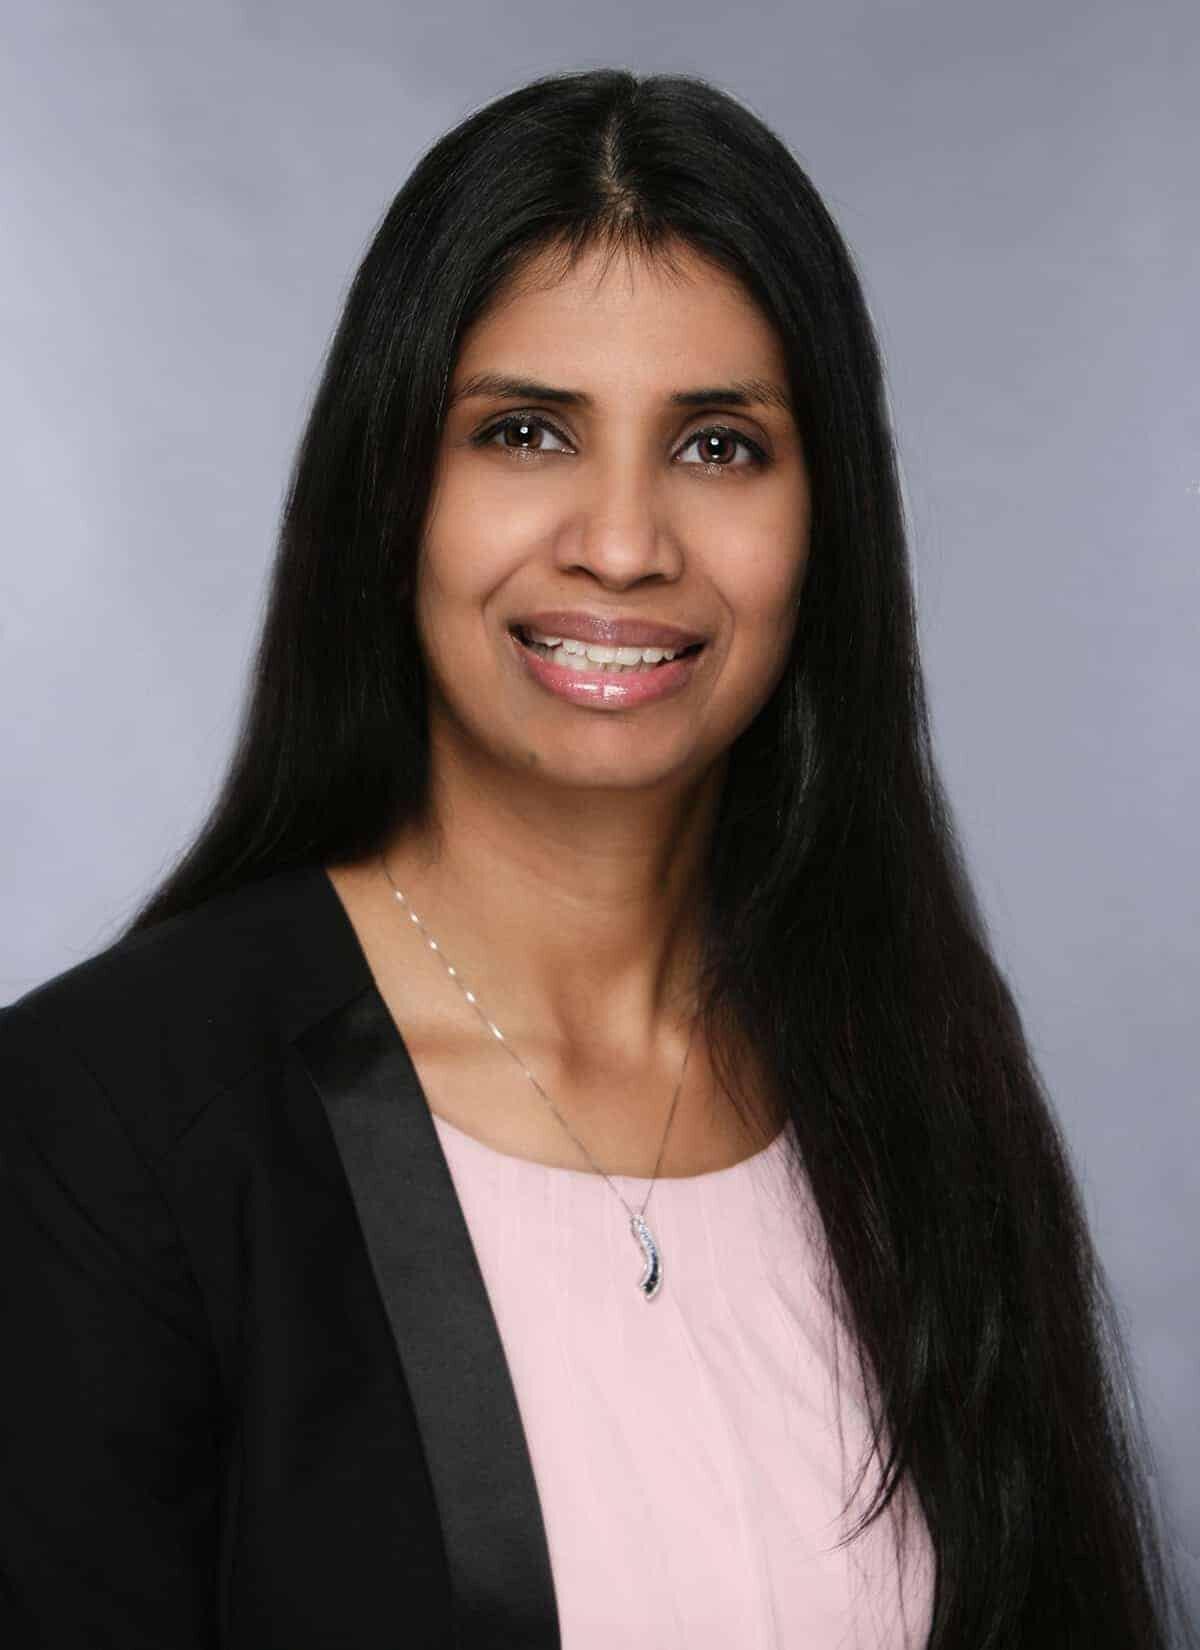 Photo of Dr. V - Lakeland - Midtown Dental